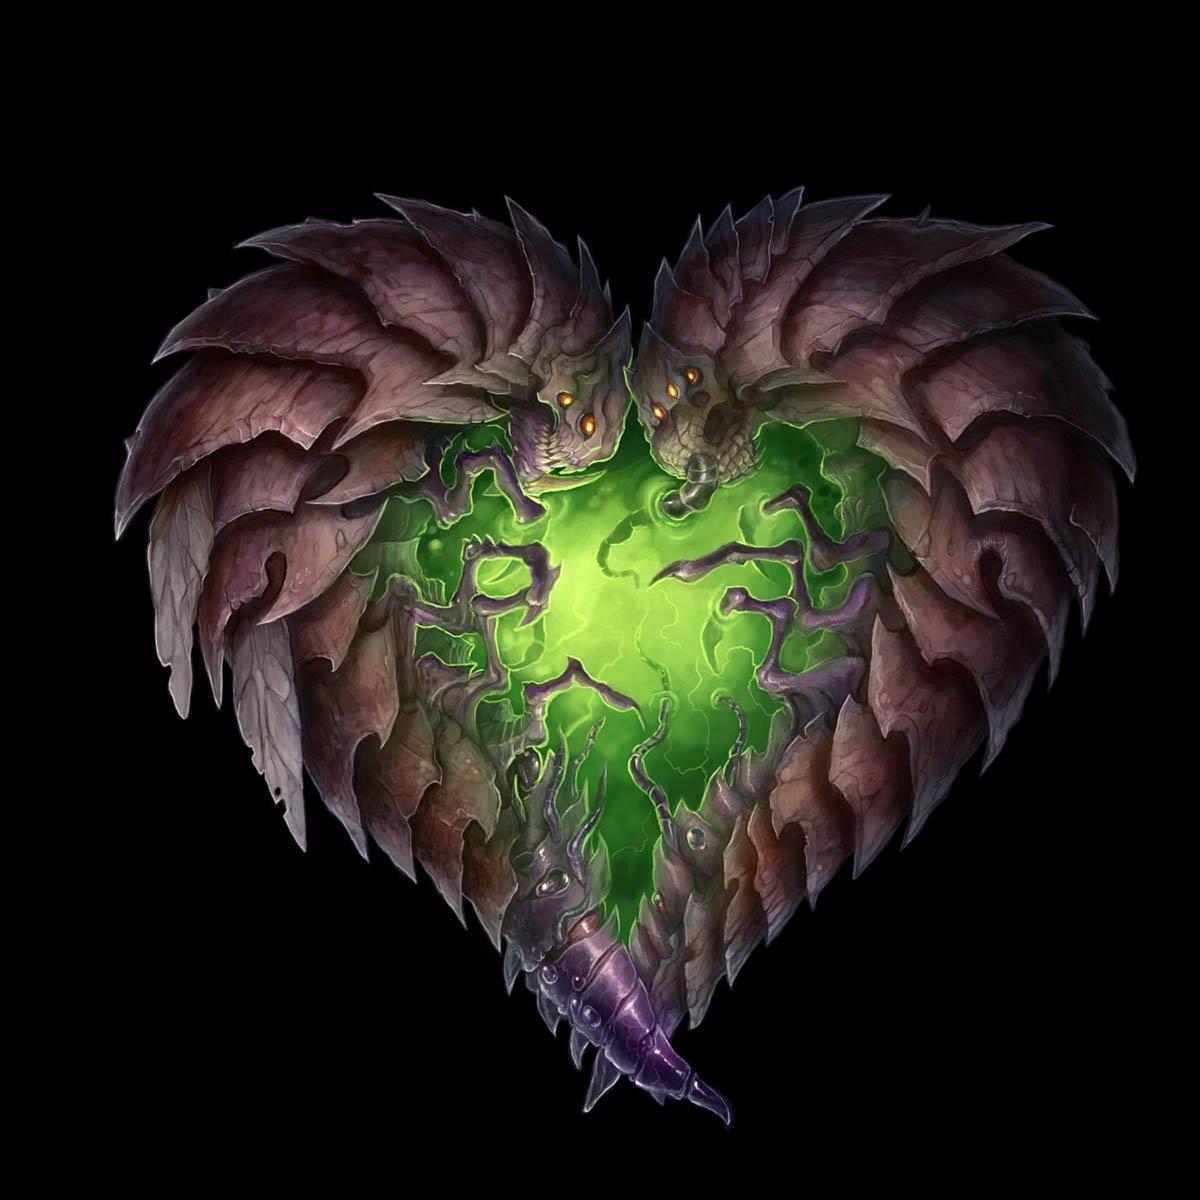 StarCraft II: Heart of the Swarm [cinematic] - Изображение 2